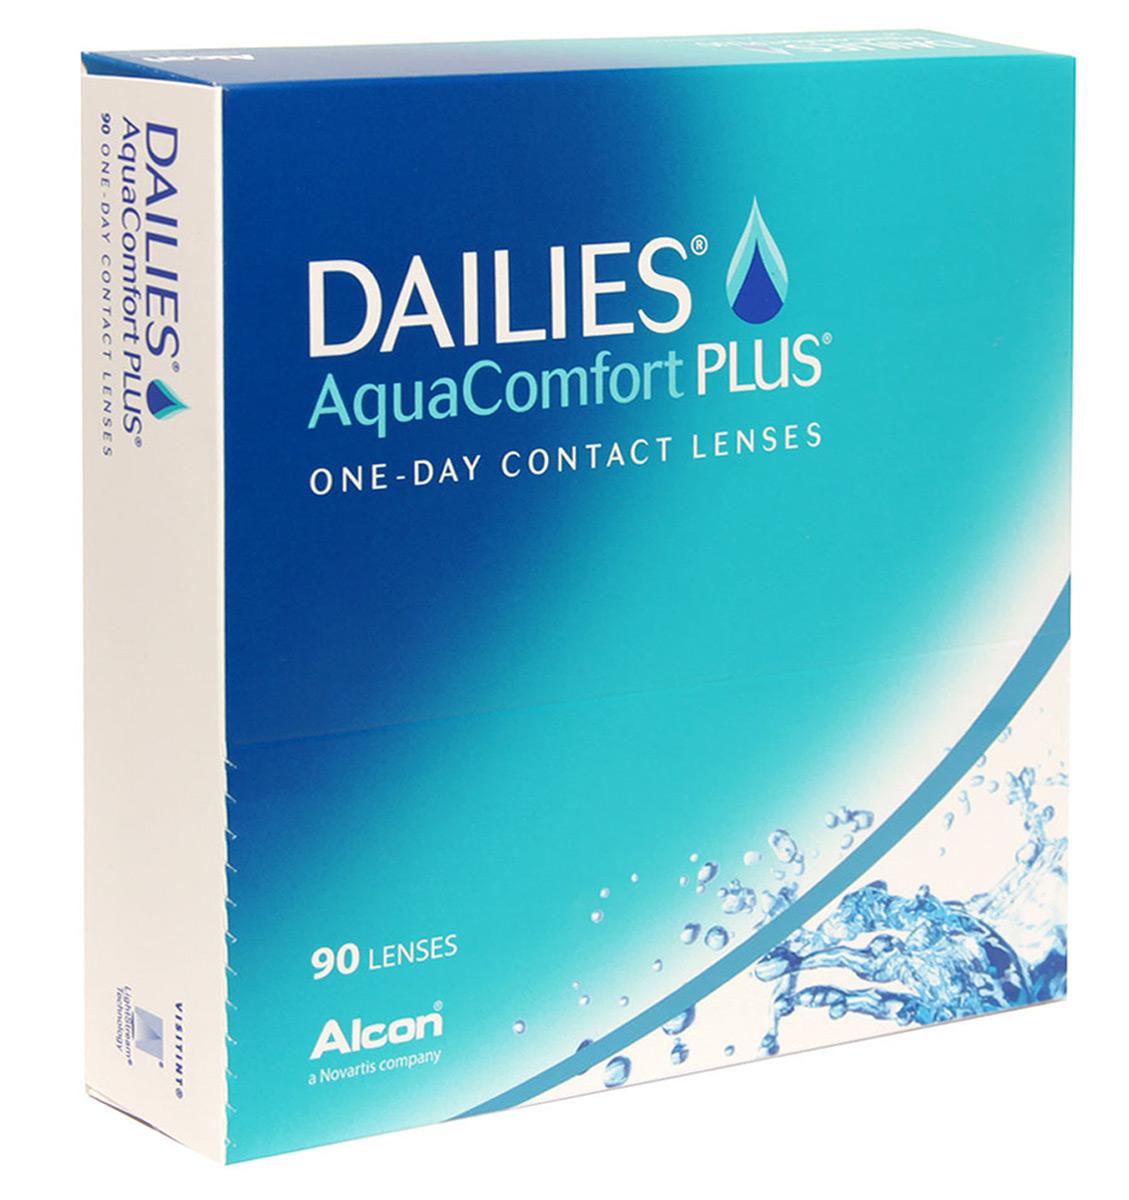 Alcon-CIBA Vision контактные линзы Dailies AquaComfort Plus (90шт / 8.7 / 14.0 / -1.75)